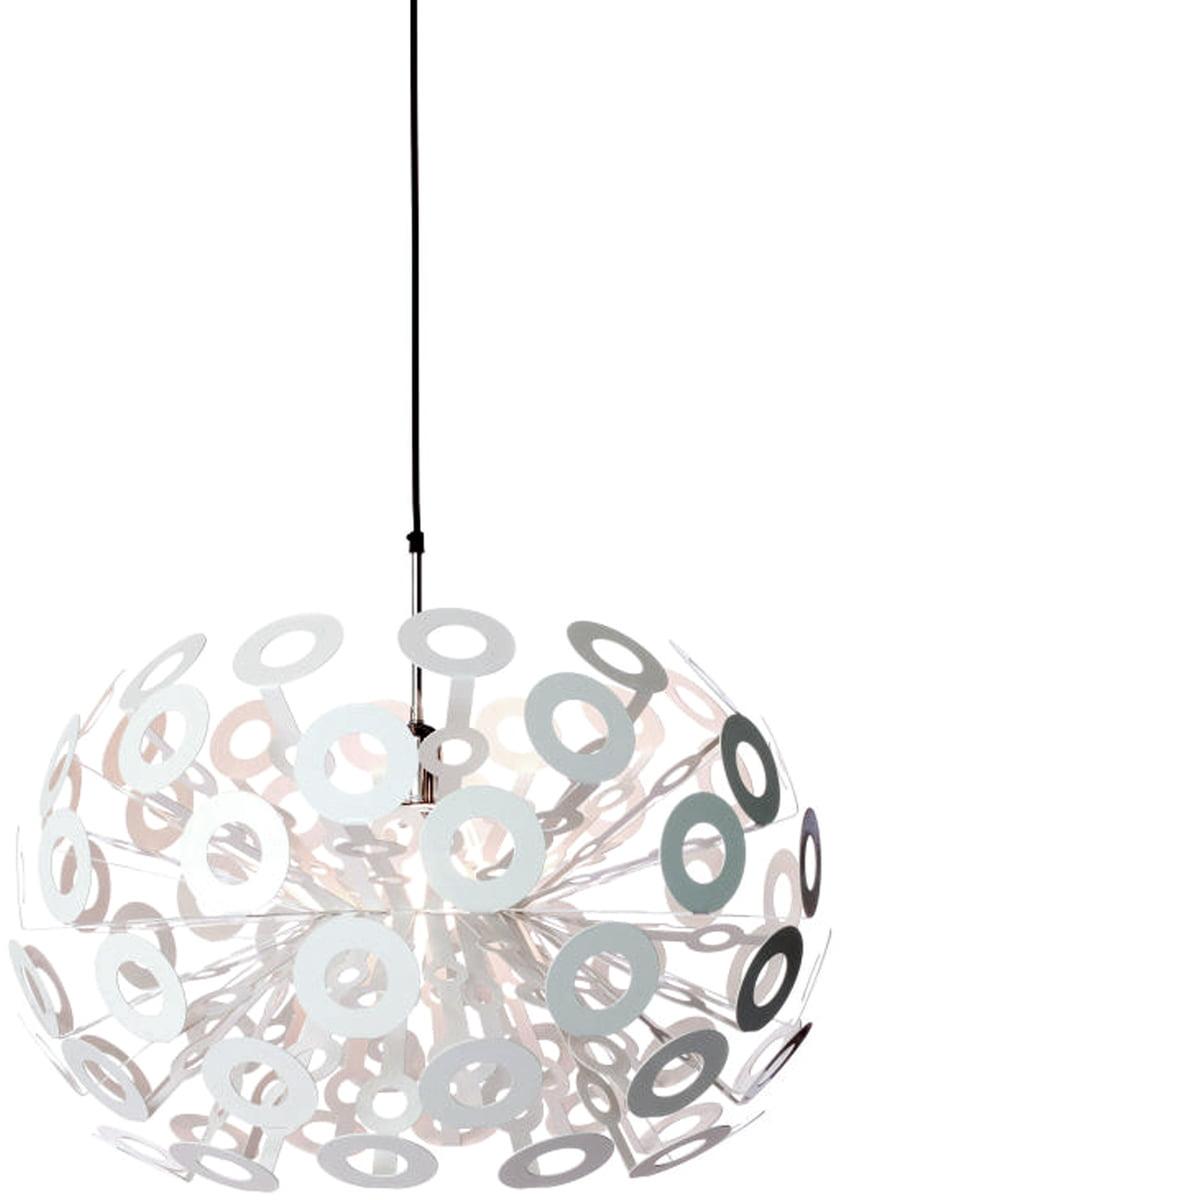 Dandelion pendant light moooi shop dandelion pendant audiocablefo